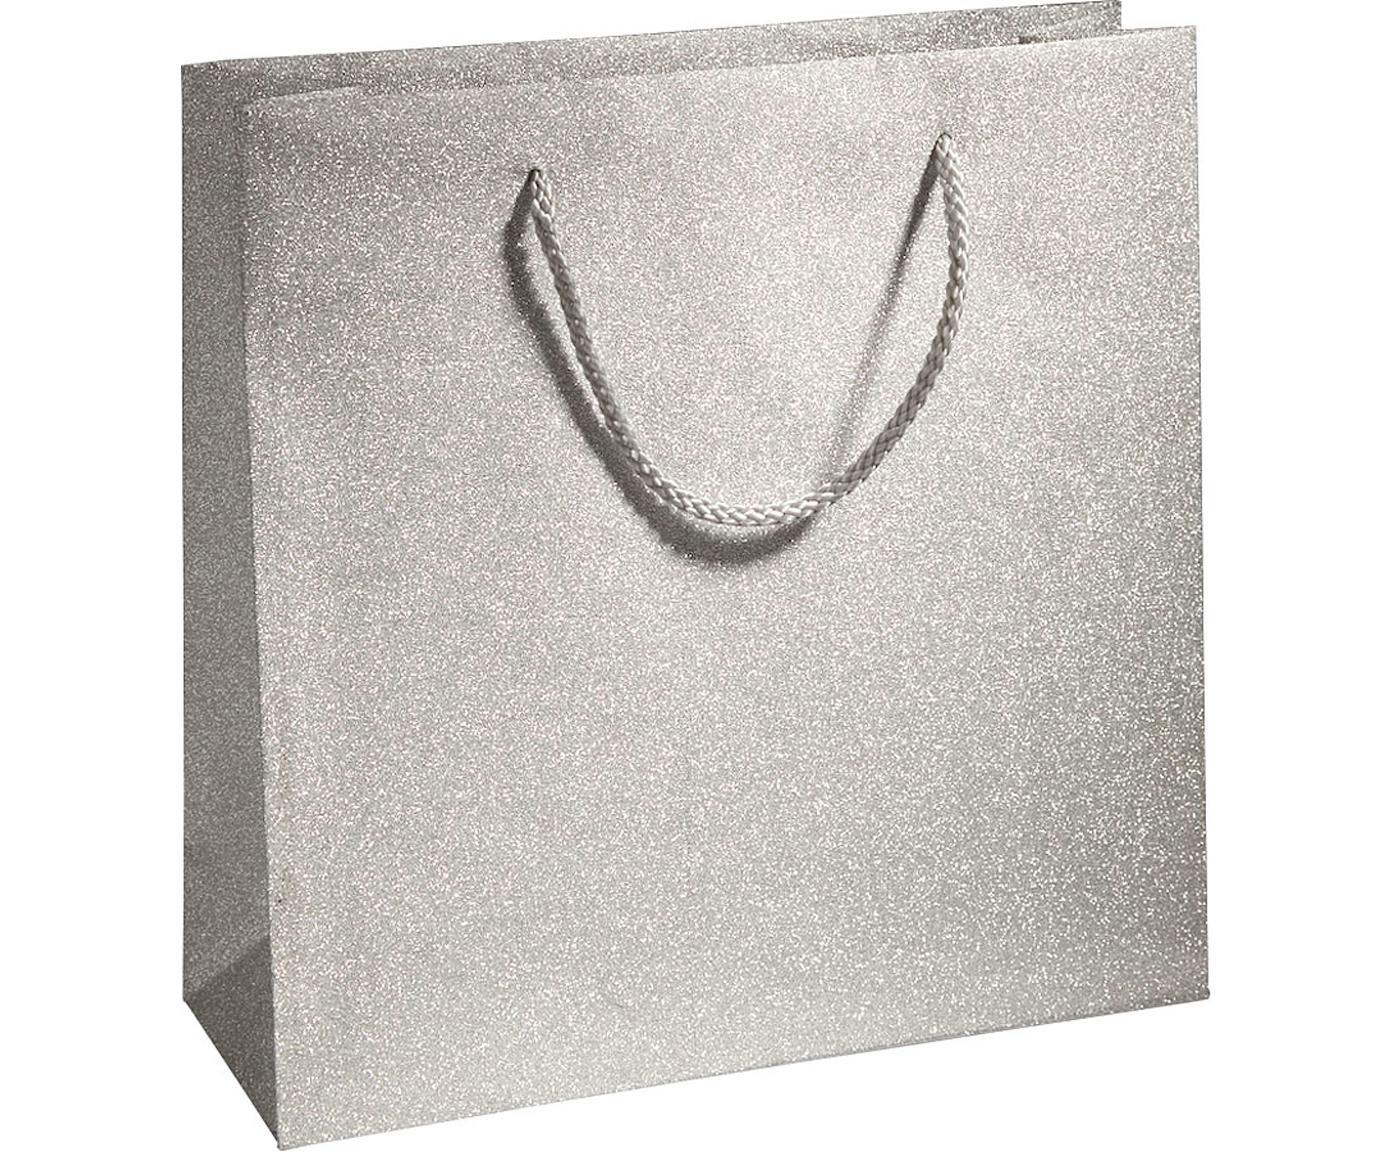 Geschenktaschen Sublime, 3 Stück, Polypropylen, Silberfarben, 28 x 28 cm